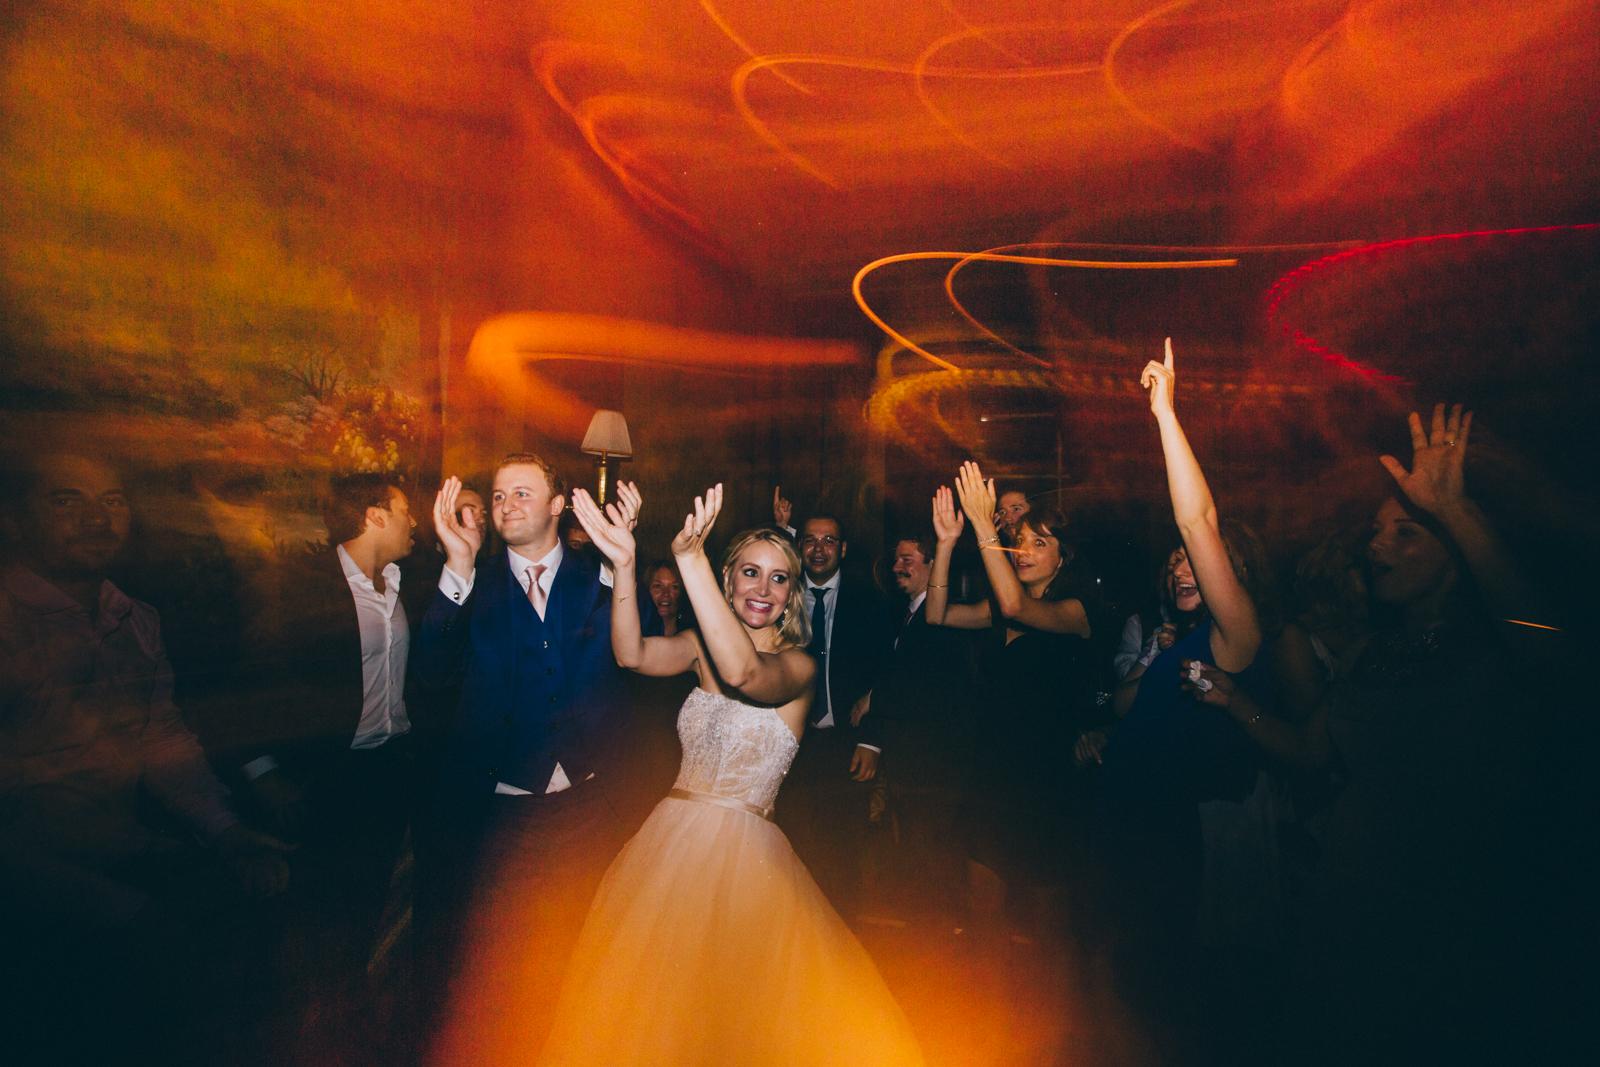 NYC Wedding Photography Sofitel Central Park Brooklyn Photographer Boris Zaretsky _B2C3250.jpg